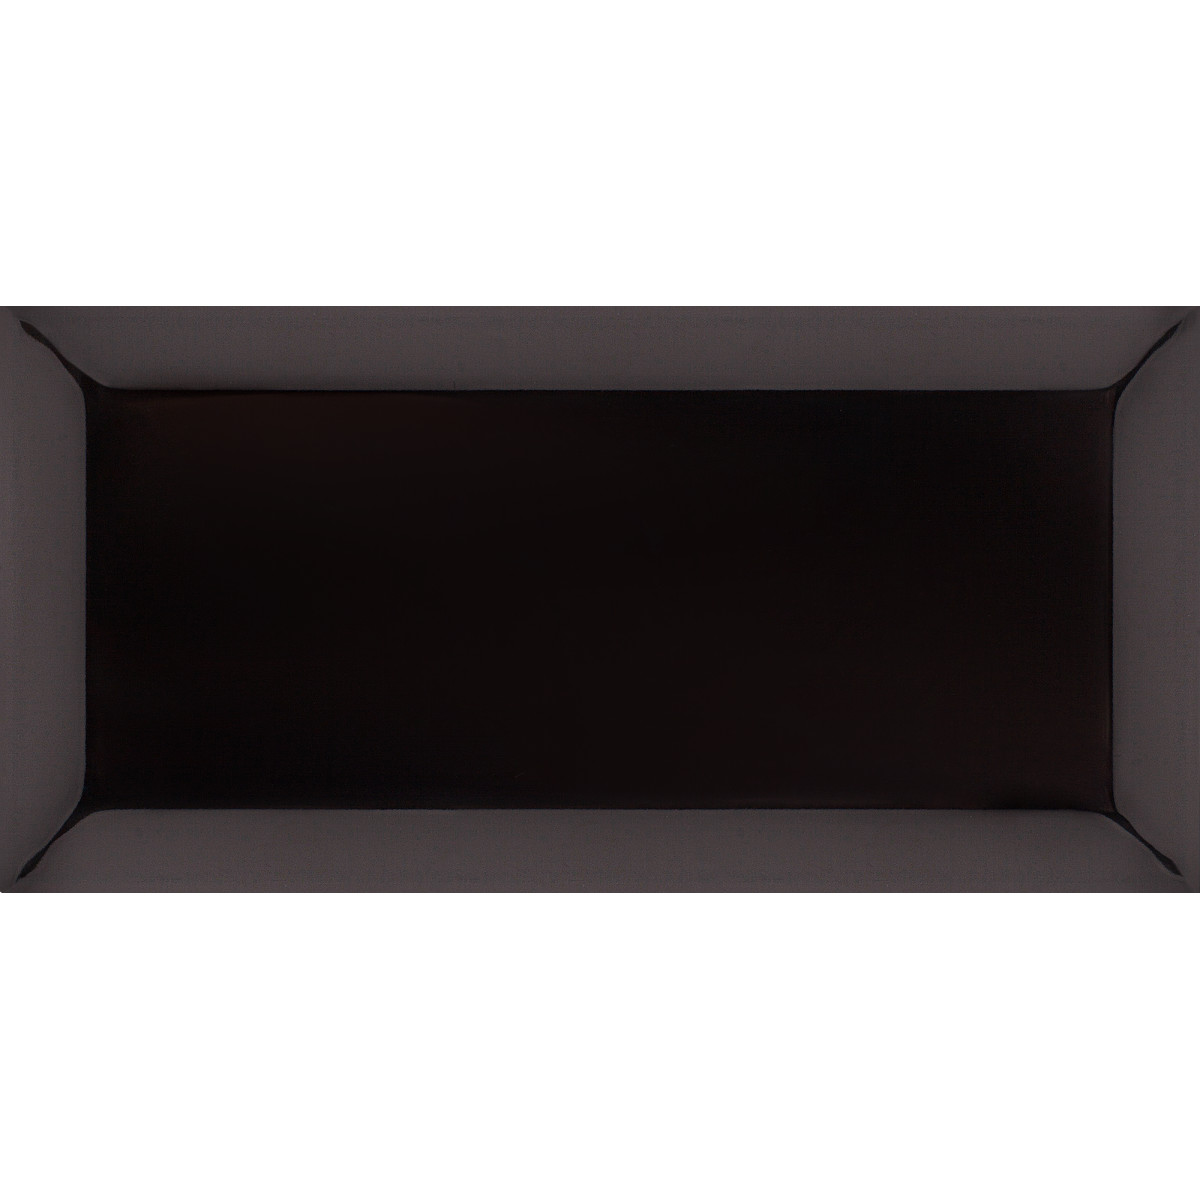 Плитка настенная Metrotiles 10х20 см 0.88 м2 цвет черный